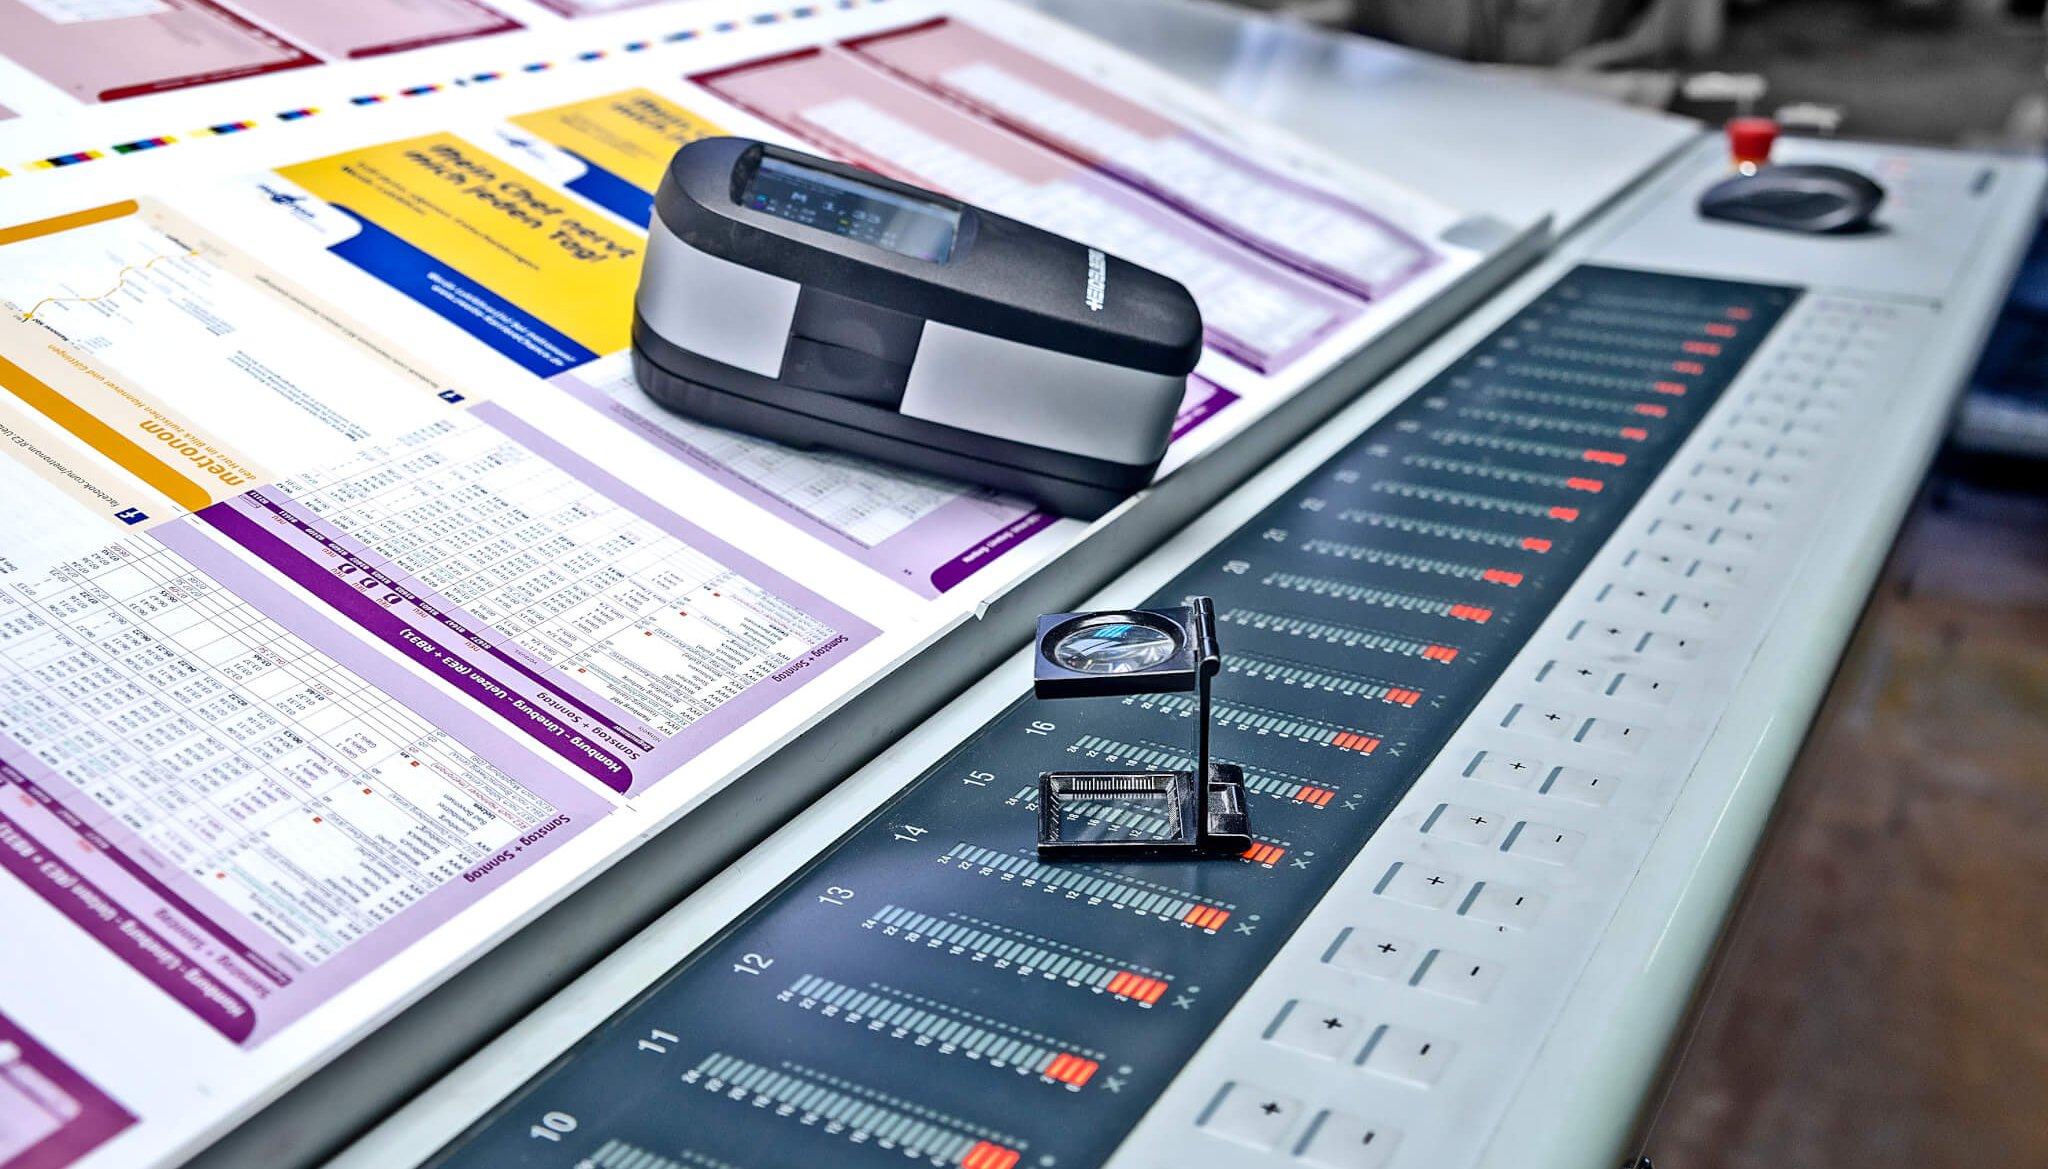 Digital- und Printmedien